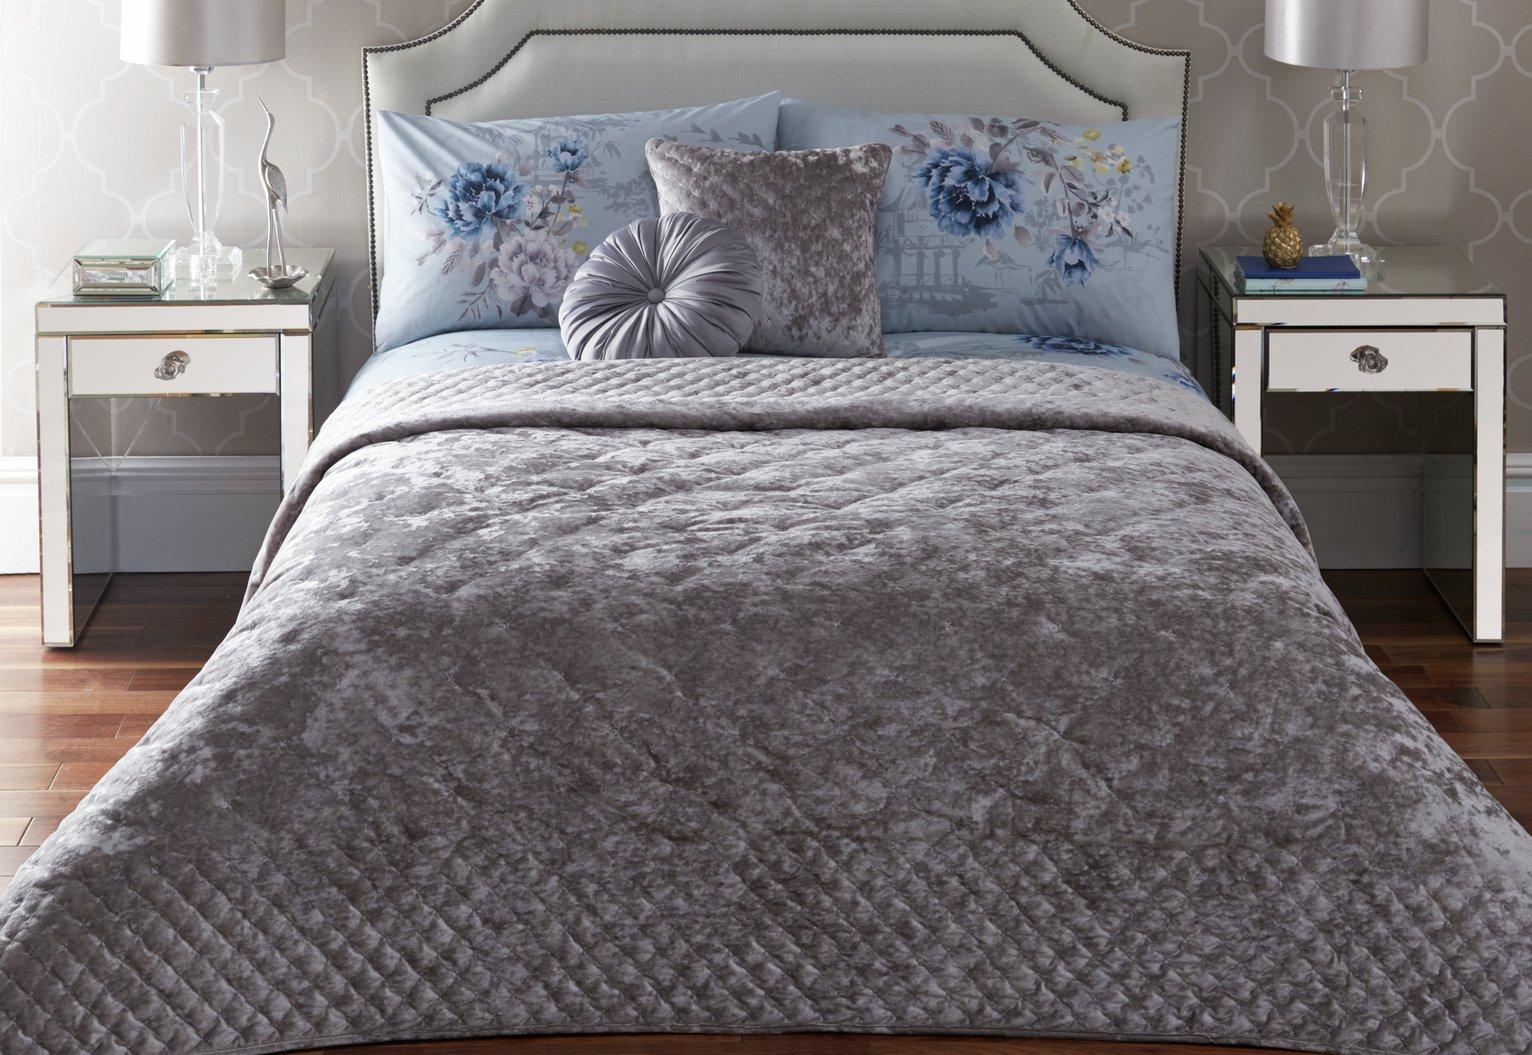 Image of Appletree Kori Bedspread - Silver